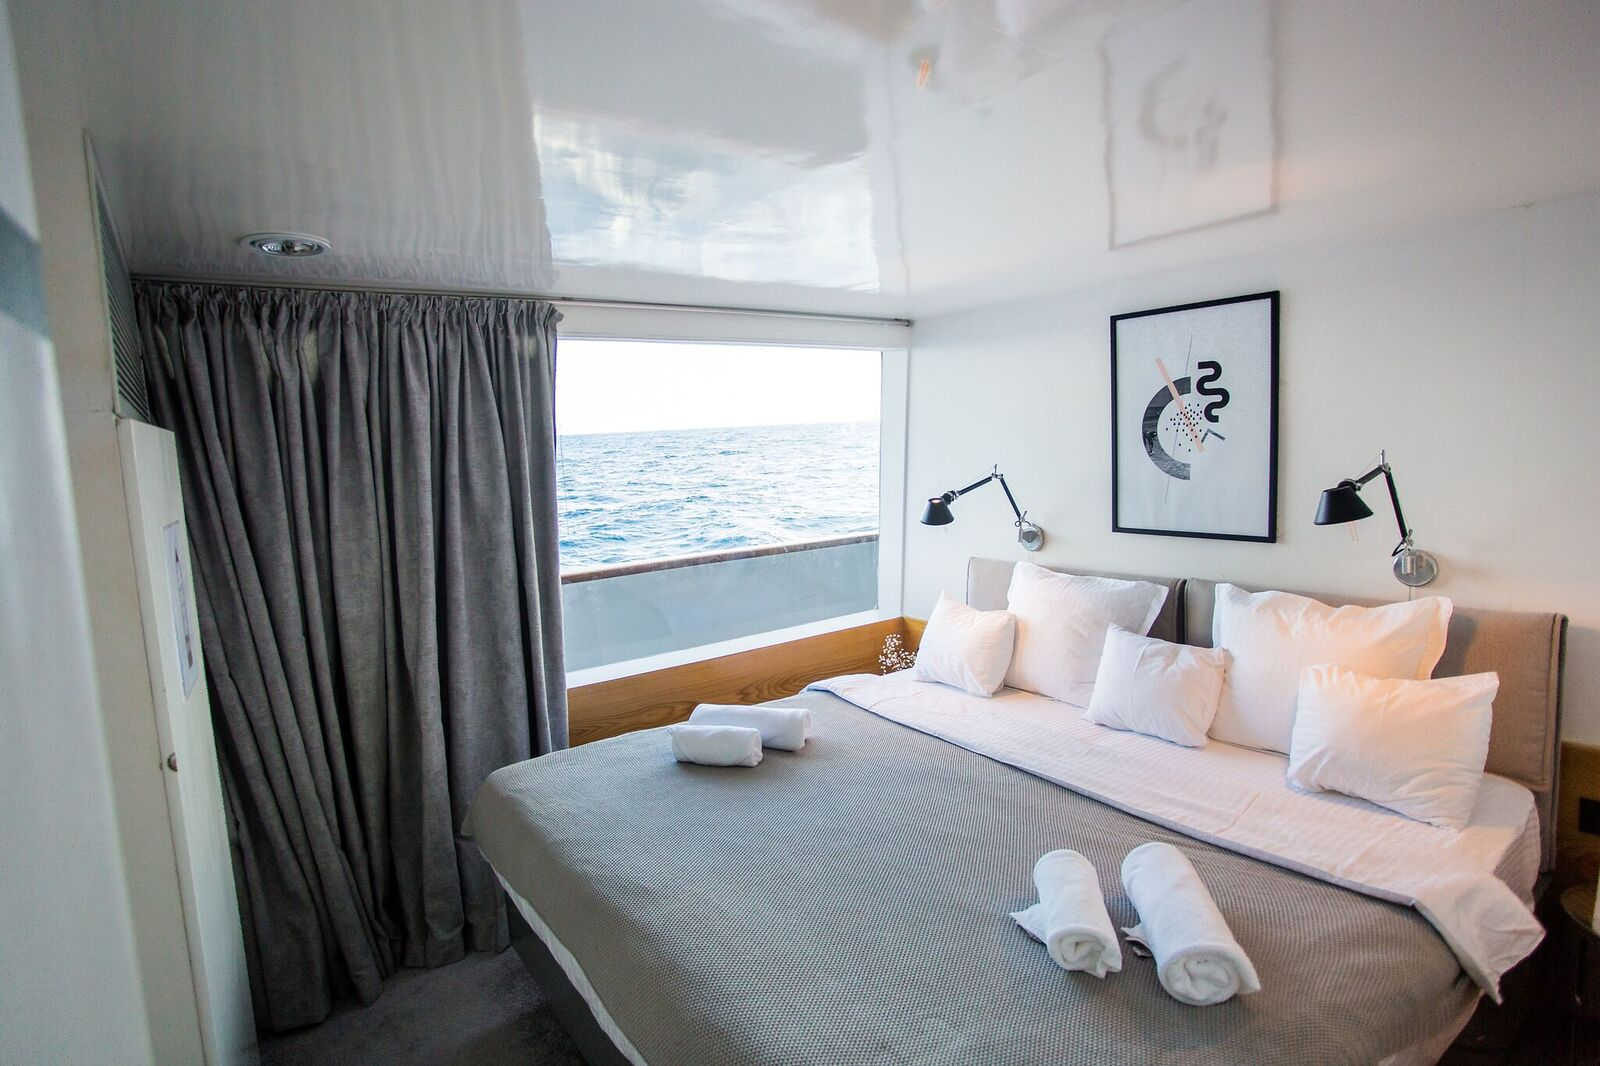 Azalea Cruise Maldives liveaboard